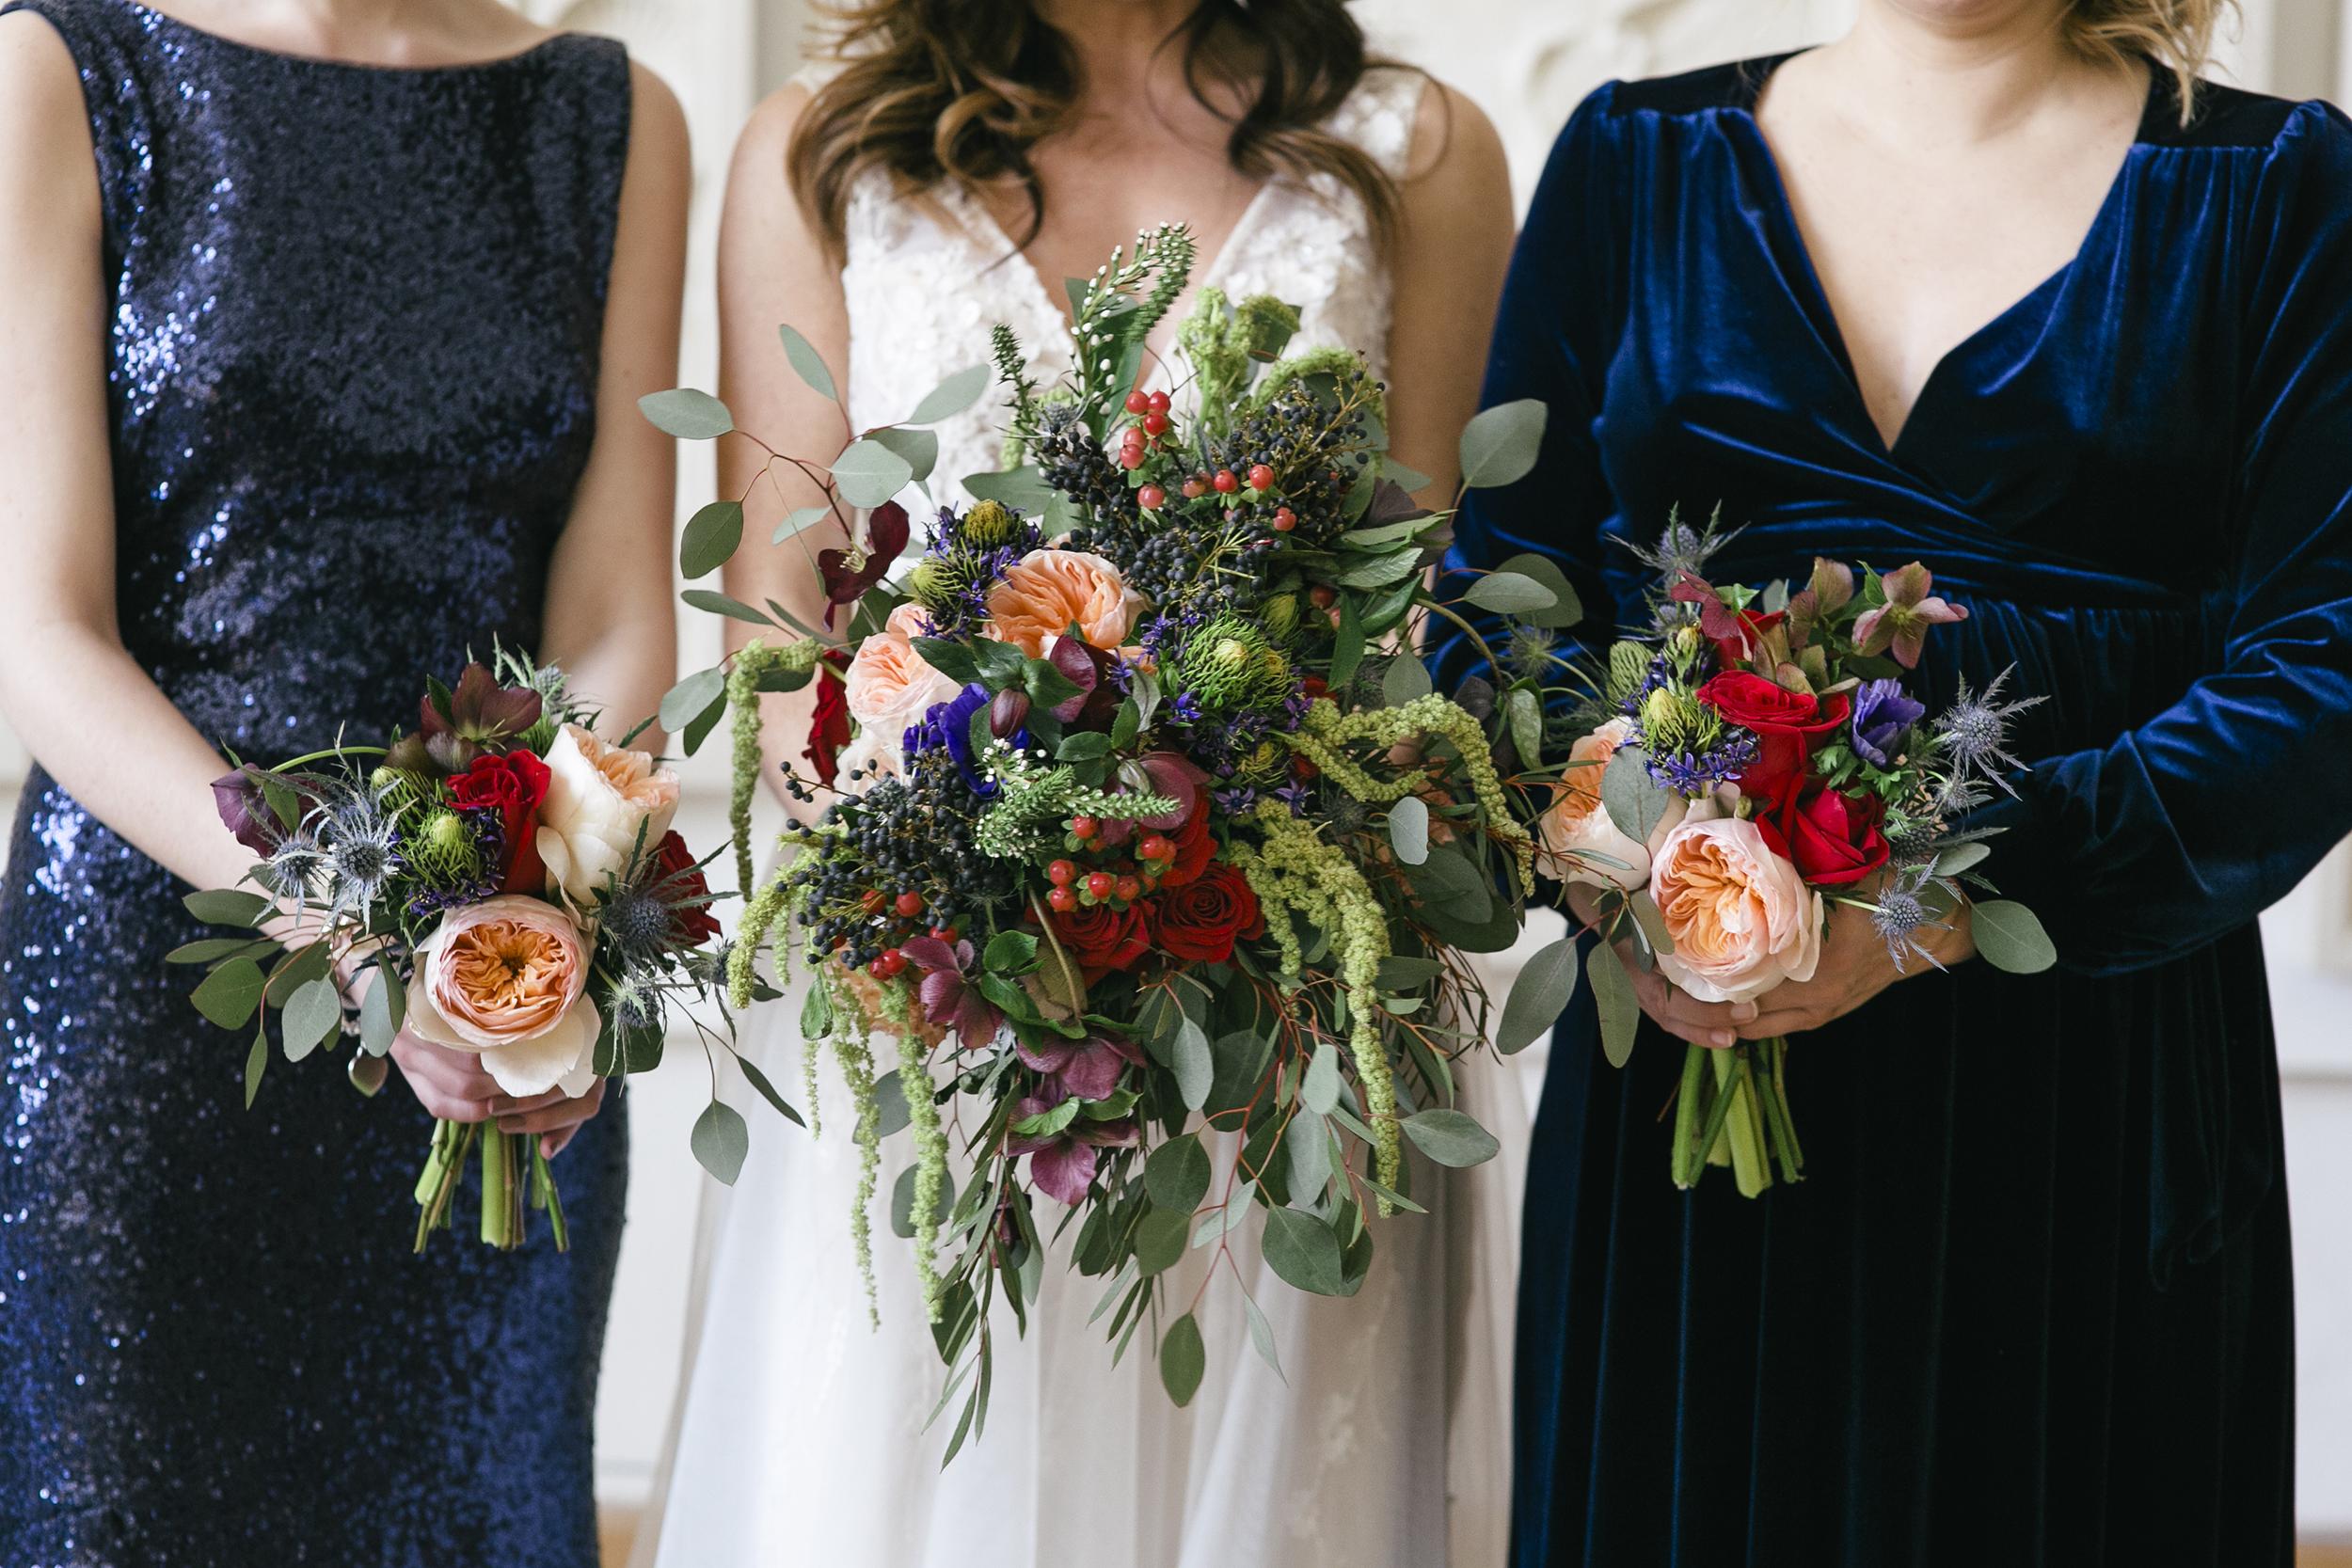 photography-wedding-weddings-natural-candid-pafa-pennsylvania academy-philadephia-philly-philadelphia wedding-mixed race-editorial-modern-fine-art-021.JPG